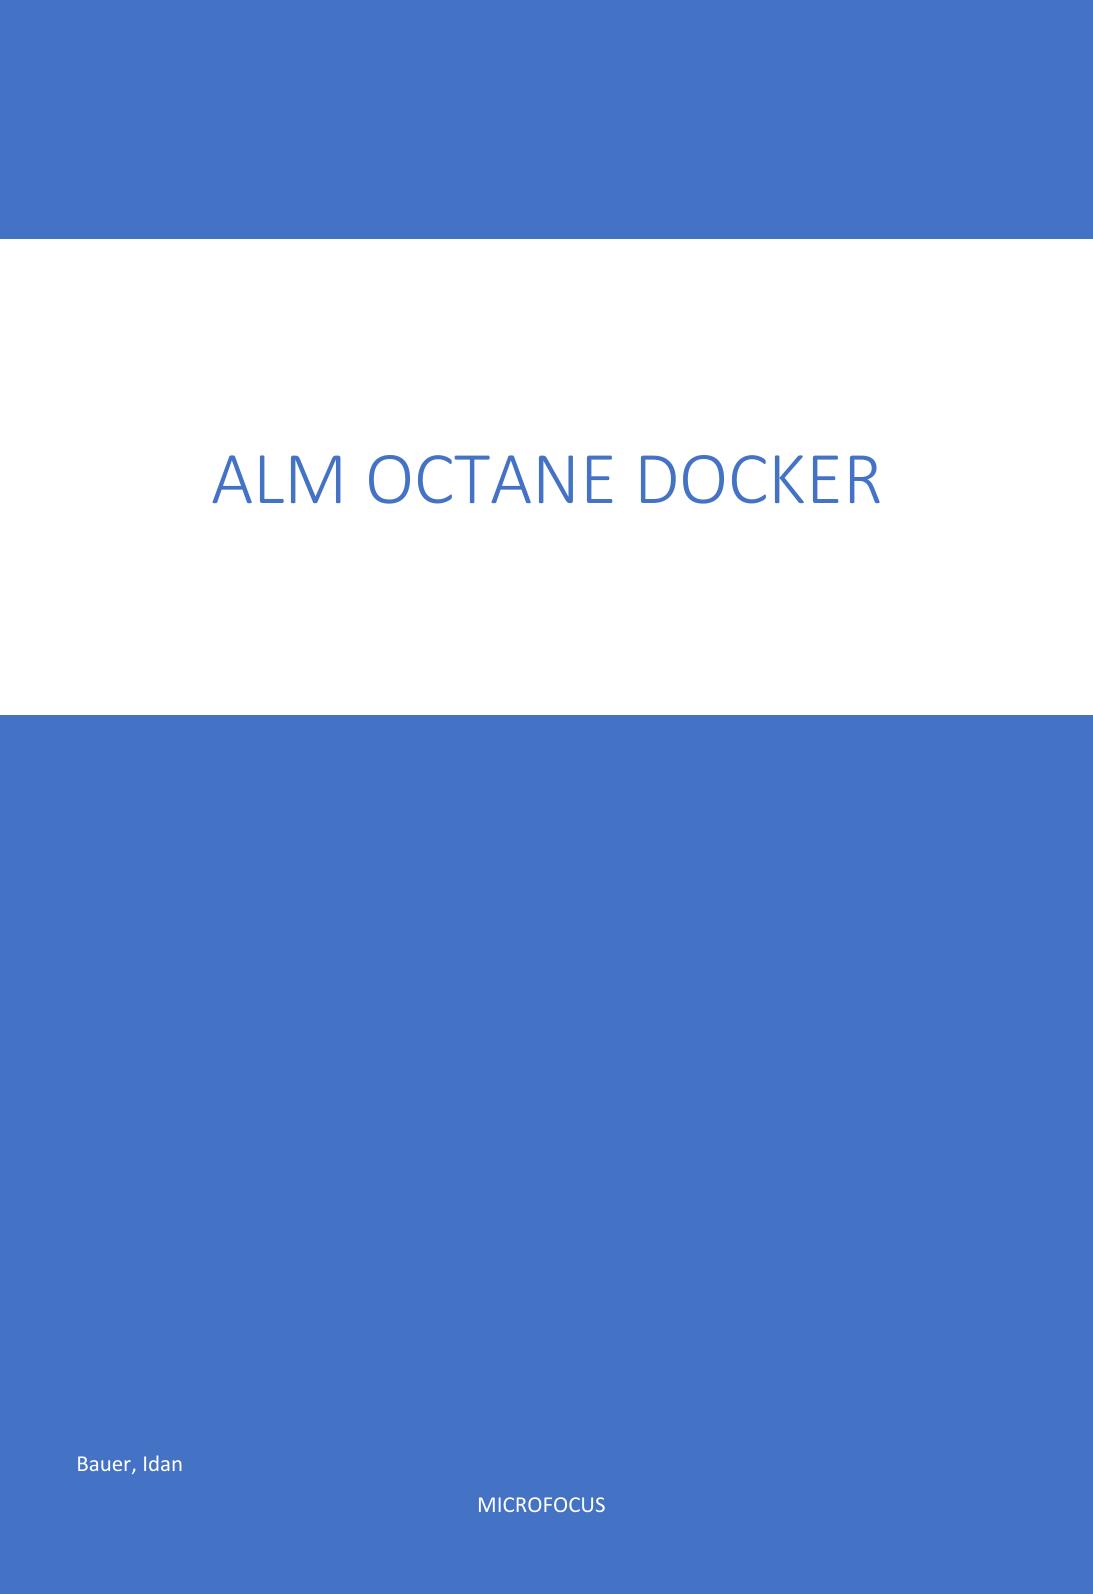 ALM OCtane Docker Installation Guide